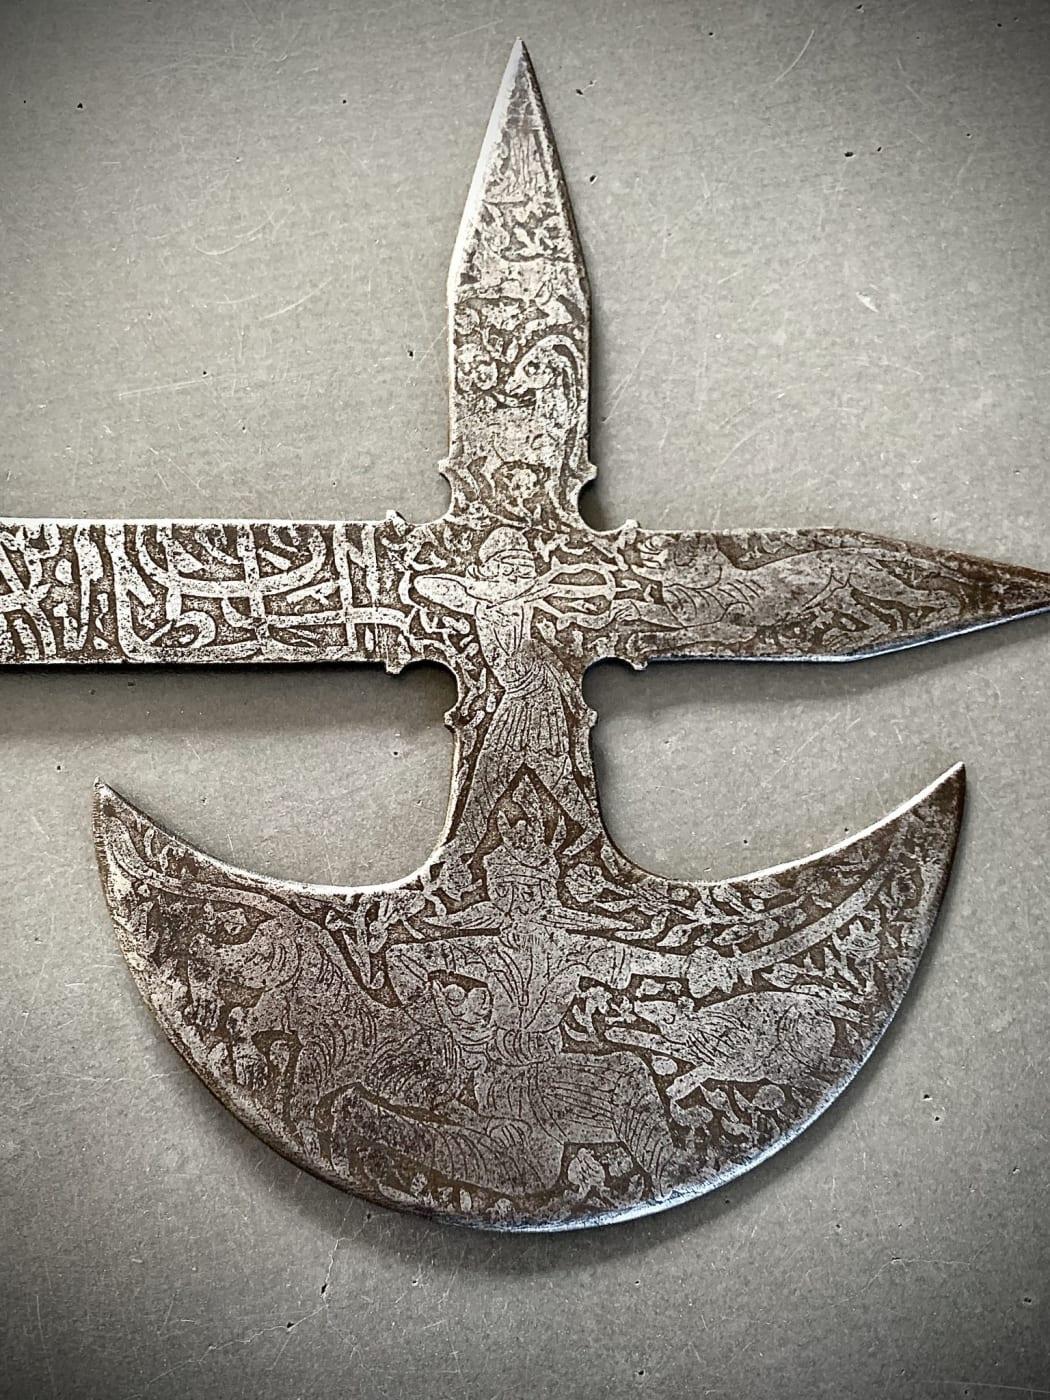 Help needed deciphering inscriptions on a Mahdist knife